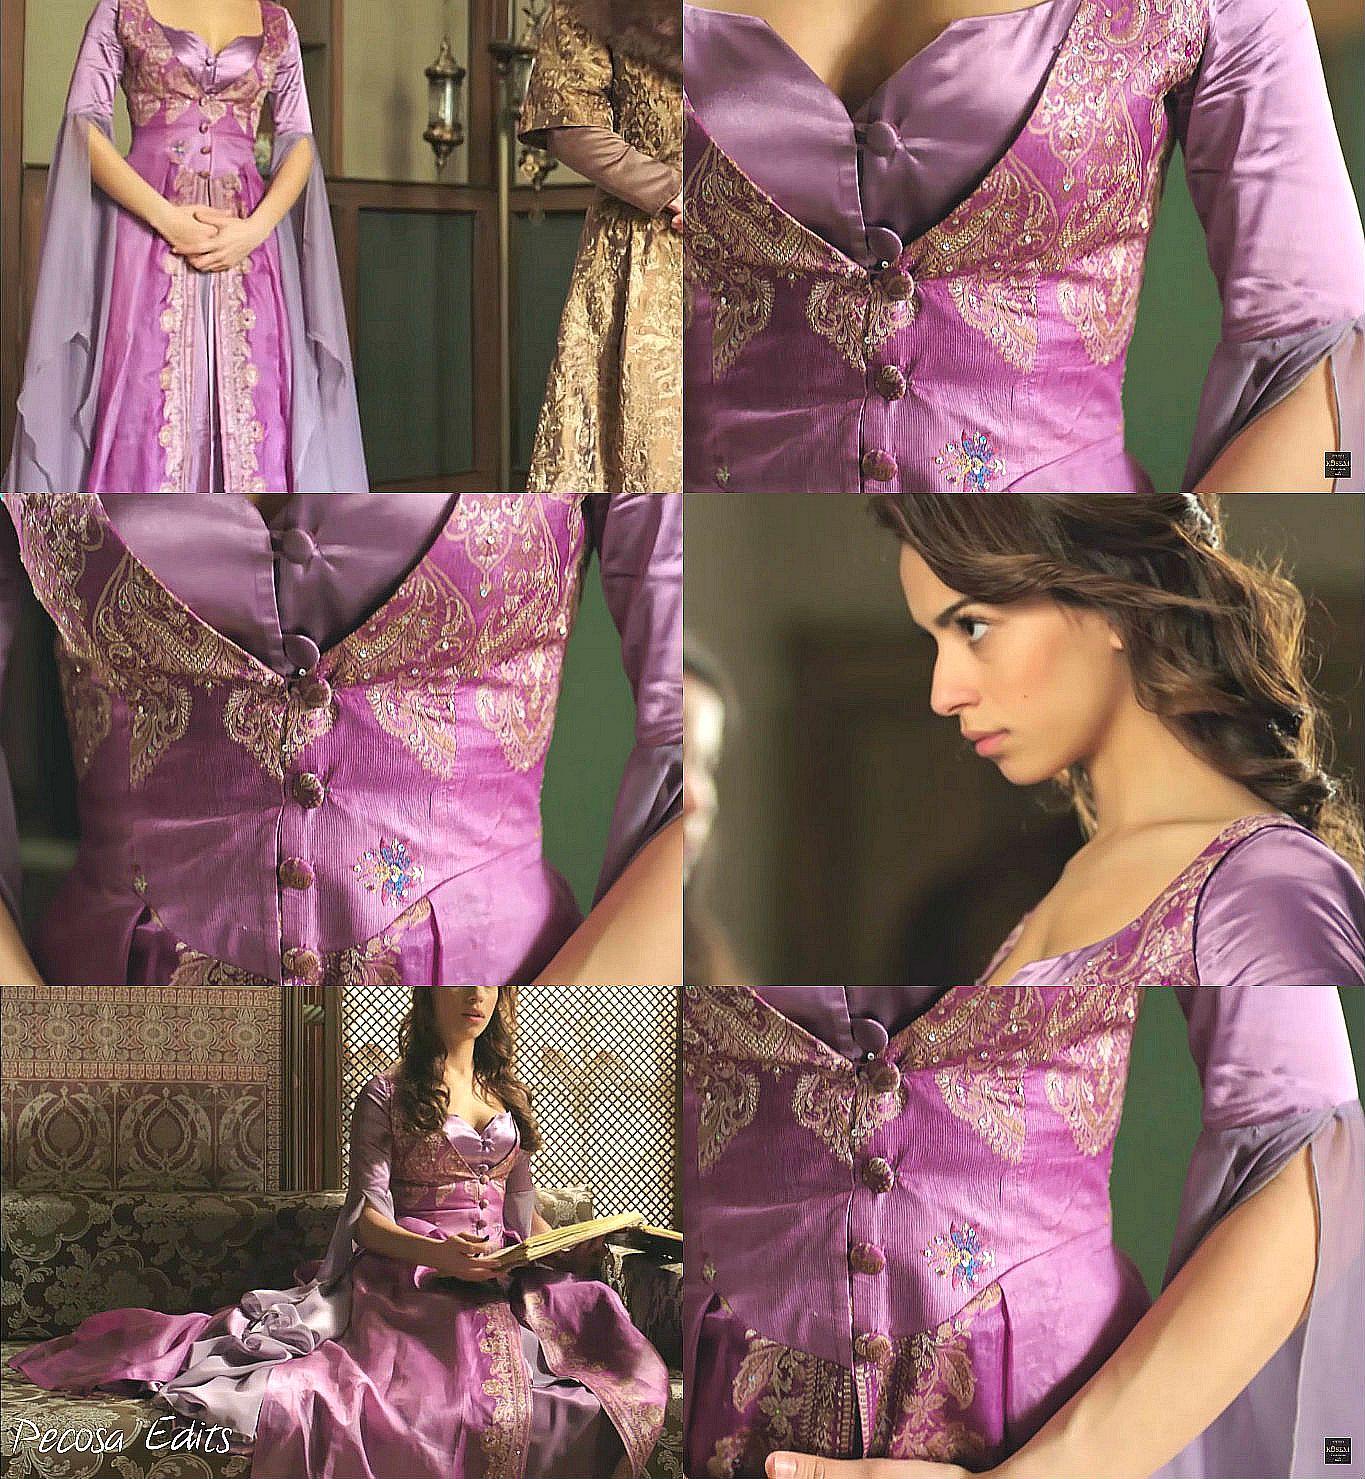 muhtesem yuzyil kosem, magnificent century kosem, Yasemin hatun, purple.pink dress